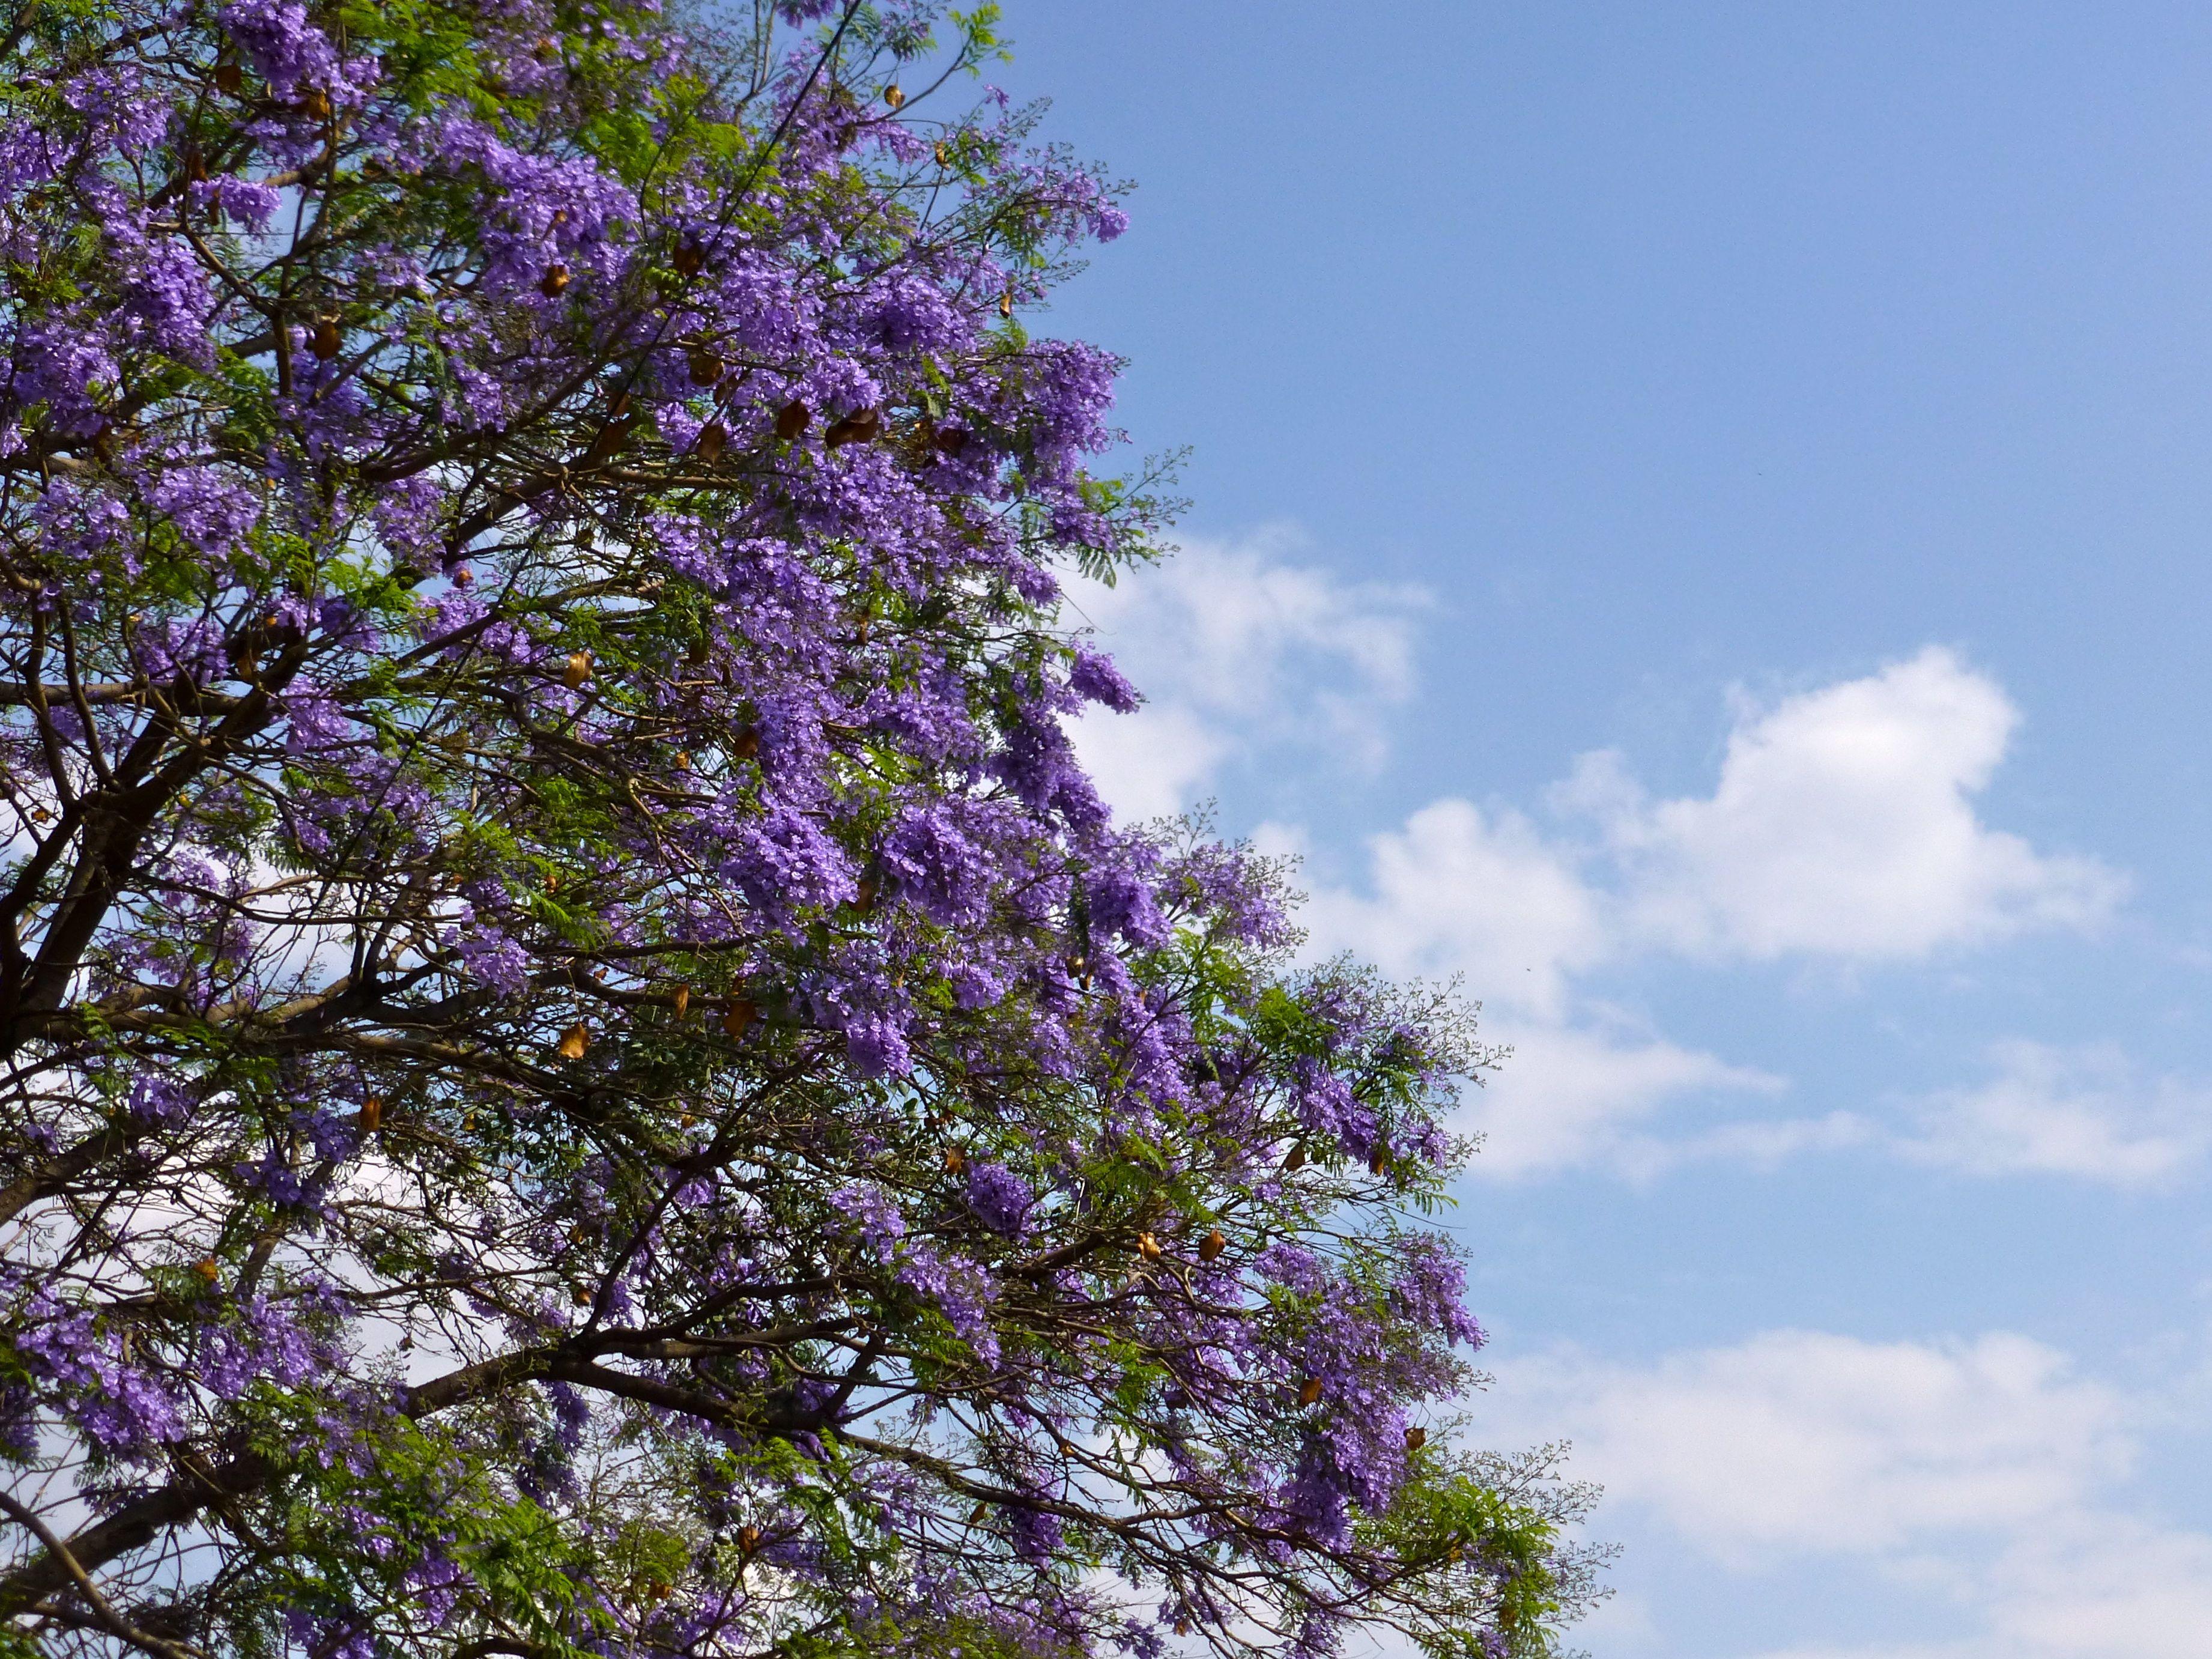 Lavender jacaranda blossoms against blue ski